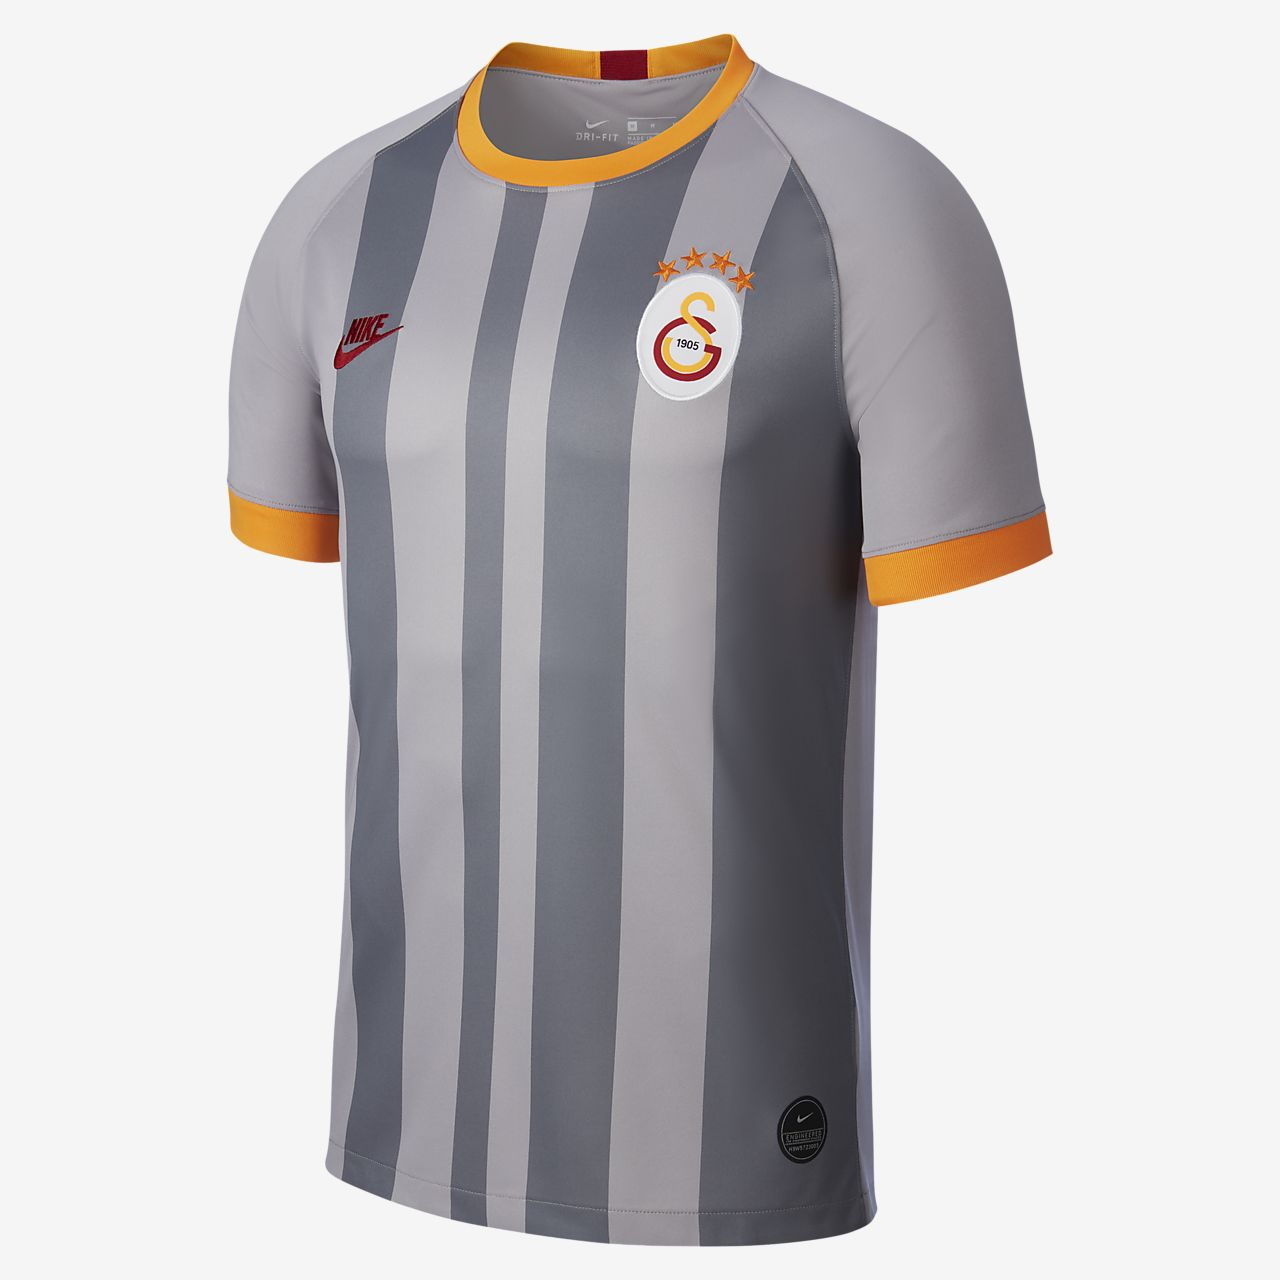 Camiseta de fútbol alternativa para hombre Stadium del Galatasaray 2019/20